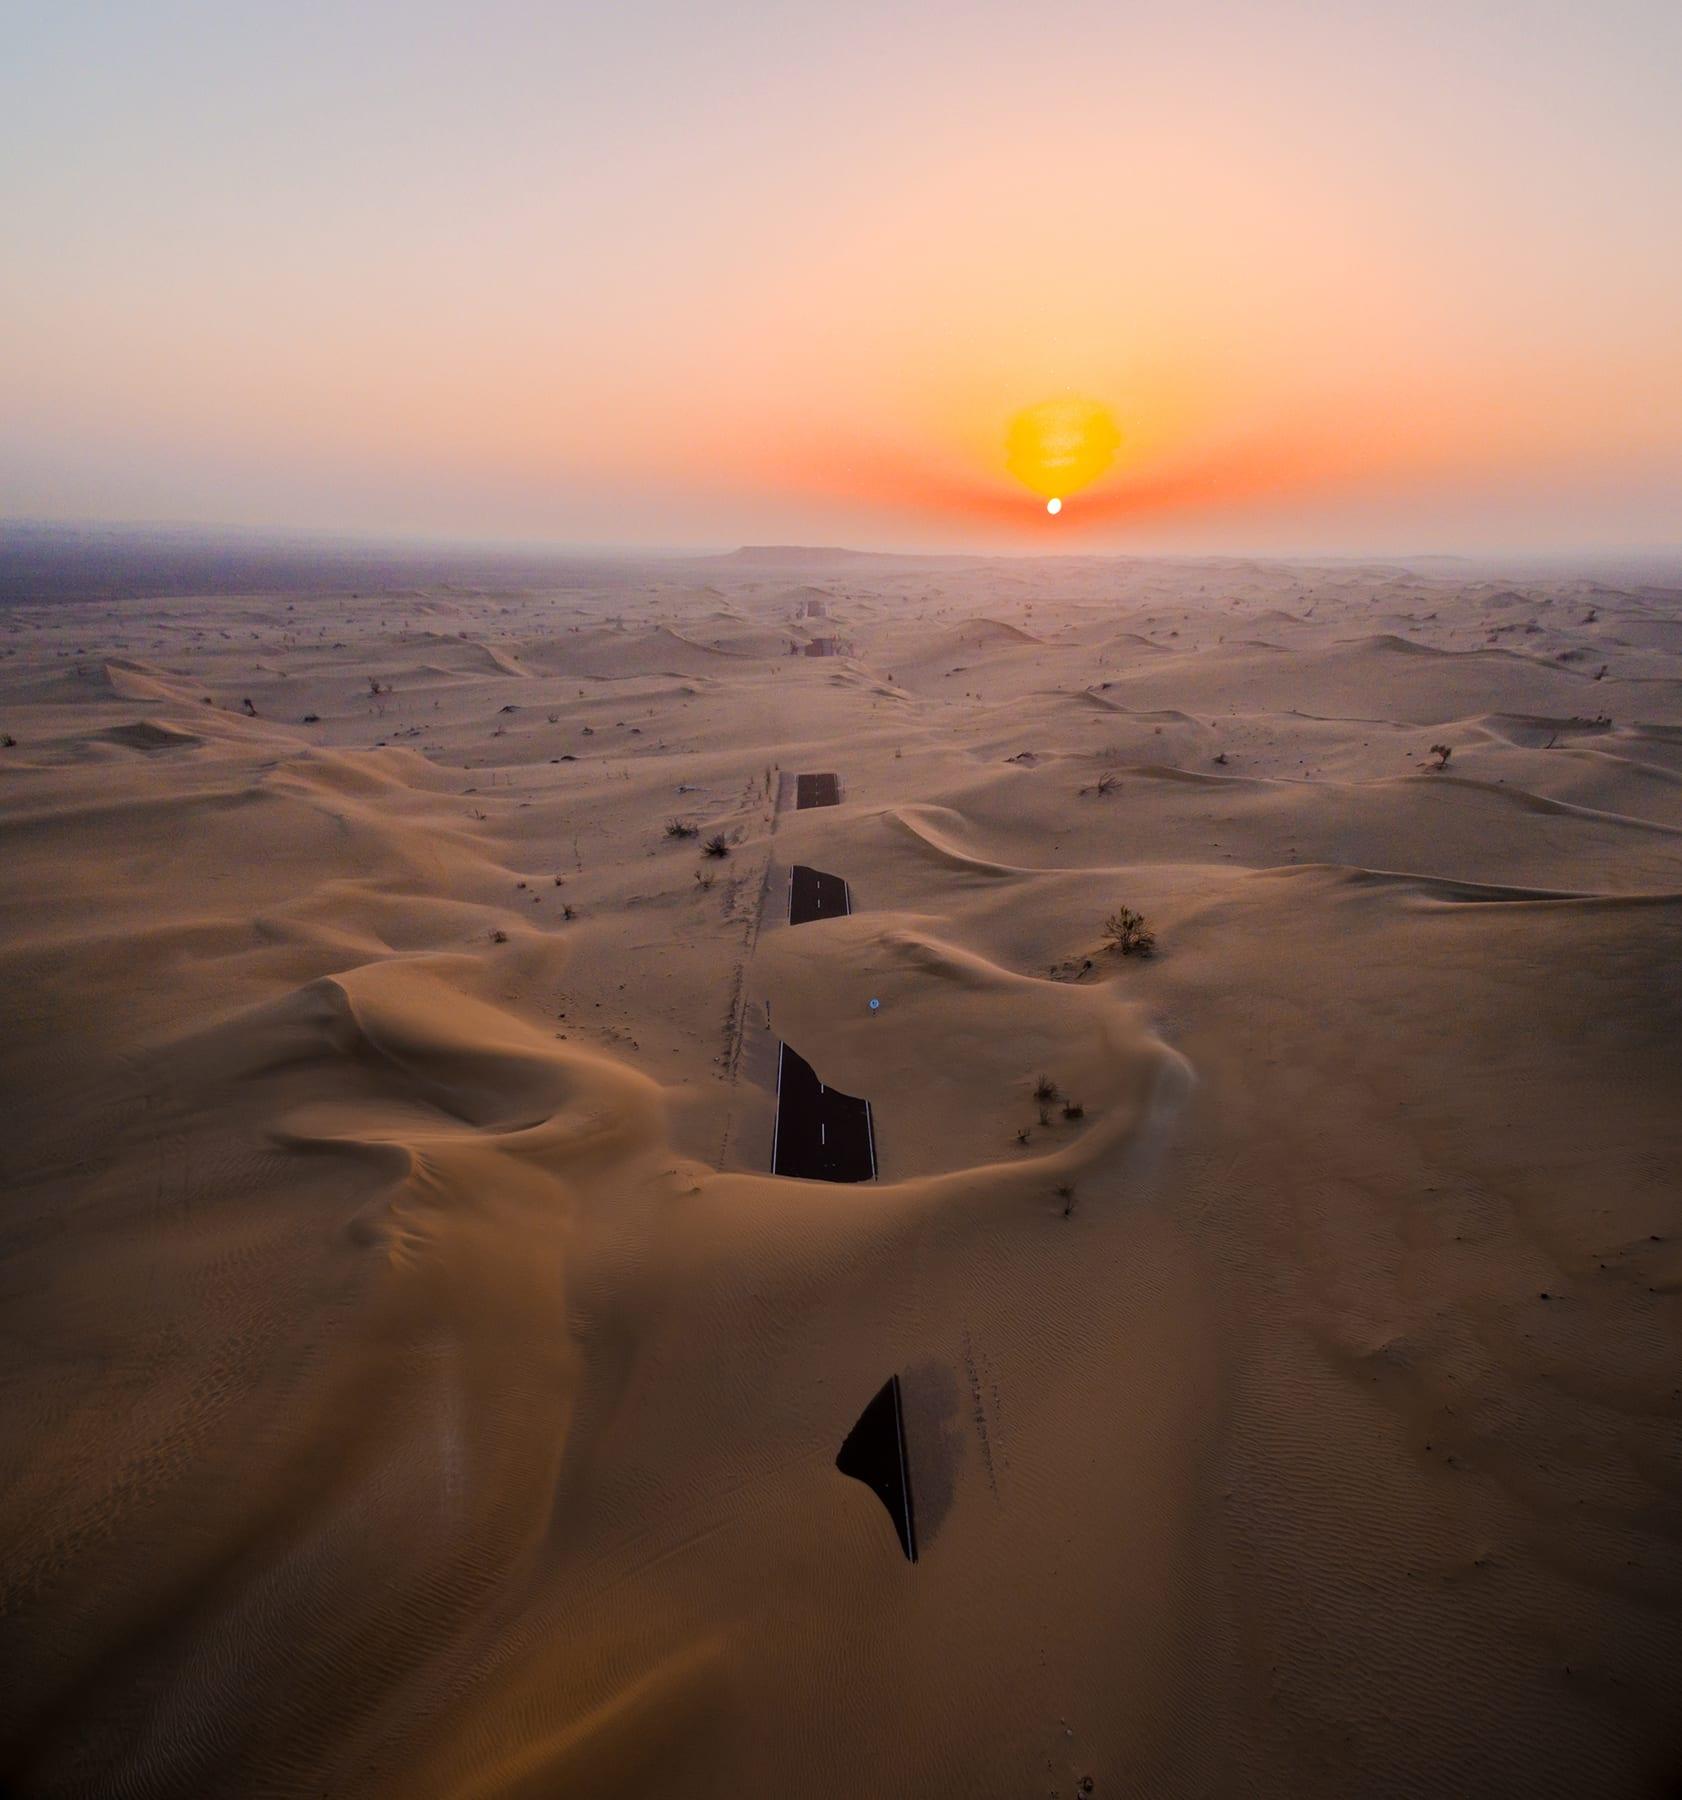 طريق مهجور بصحراء أبوظبي